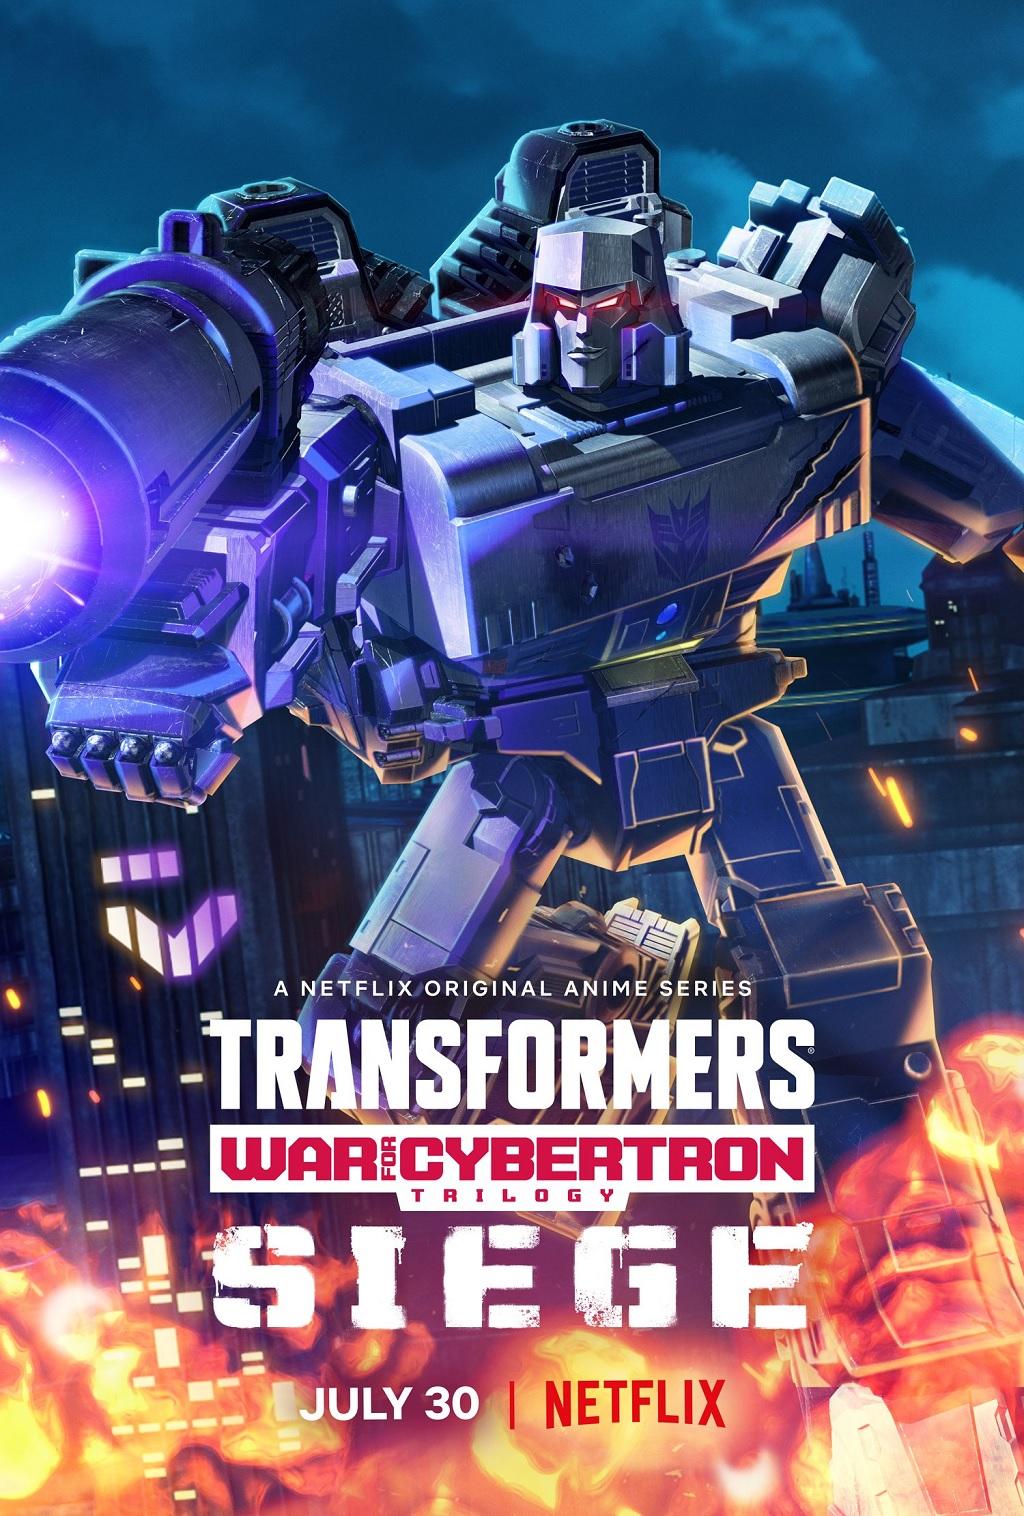 Transformers: War for Cybertron Trilogy: Siege Photo Netflix Indonesia